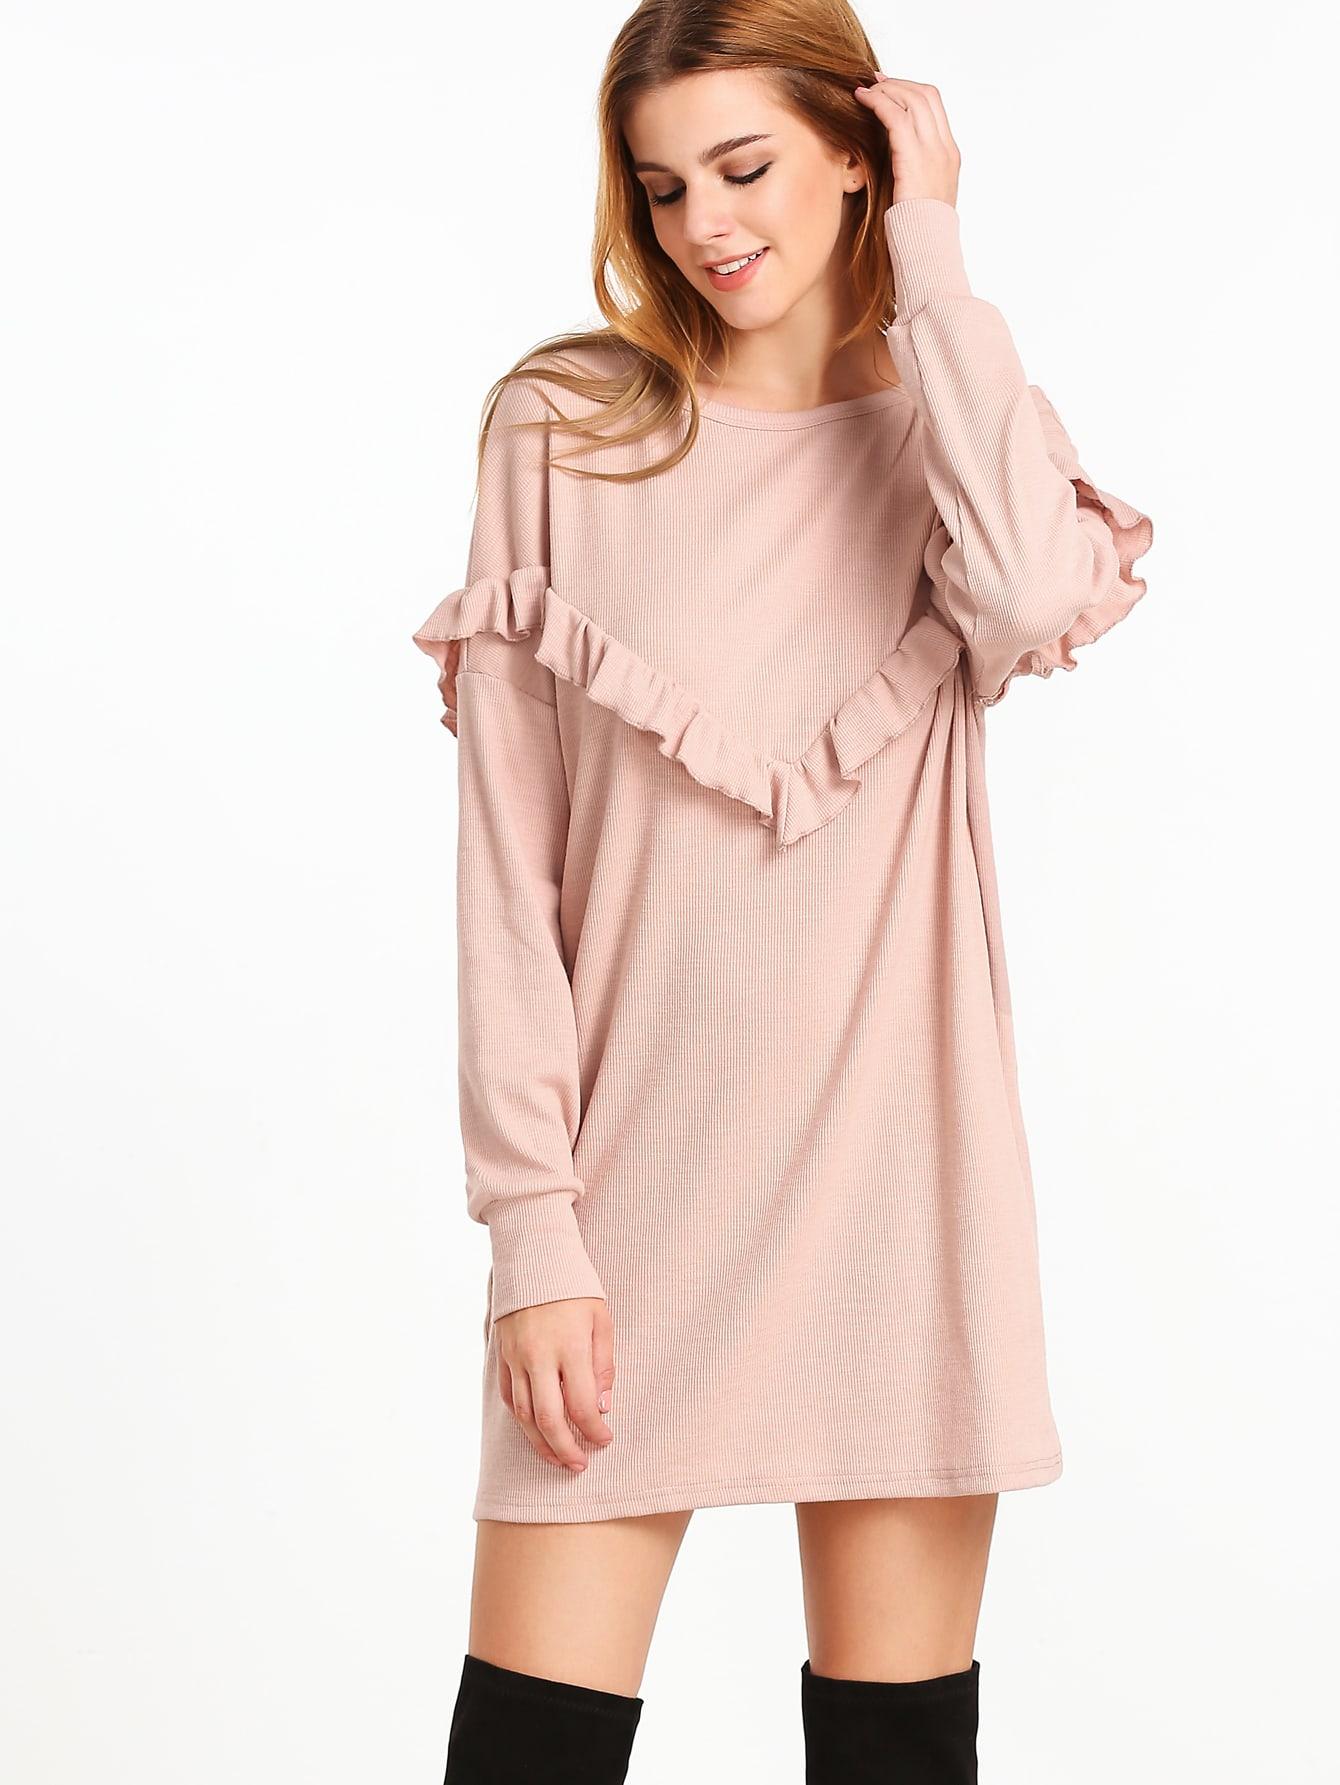 Pale Pink Ruffle Trim Drop Shoulder Ribbed Dress dress161124713